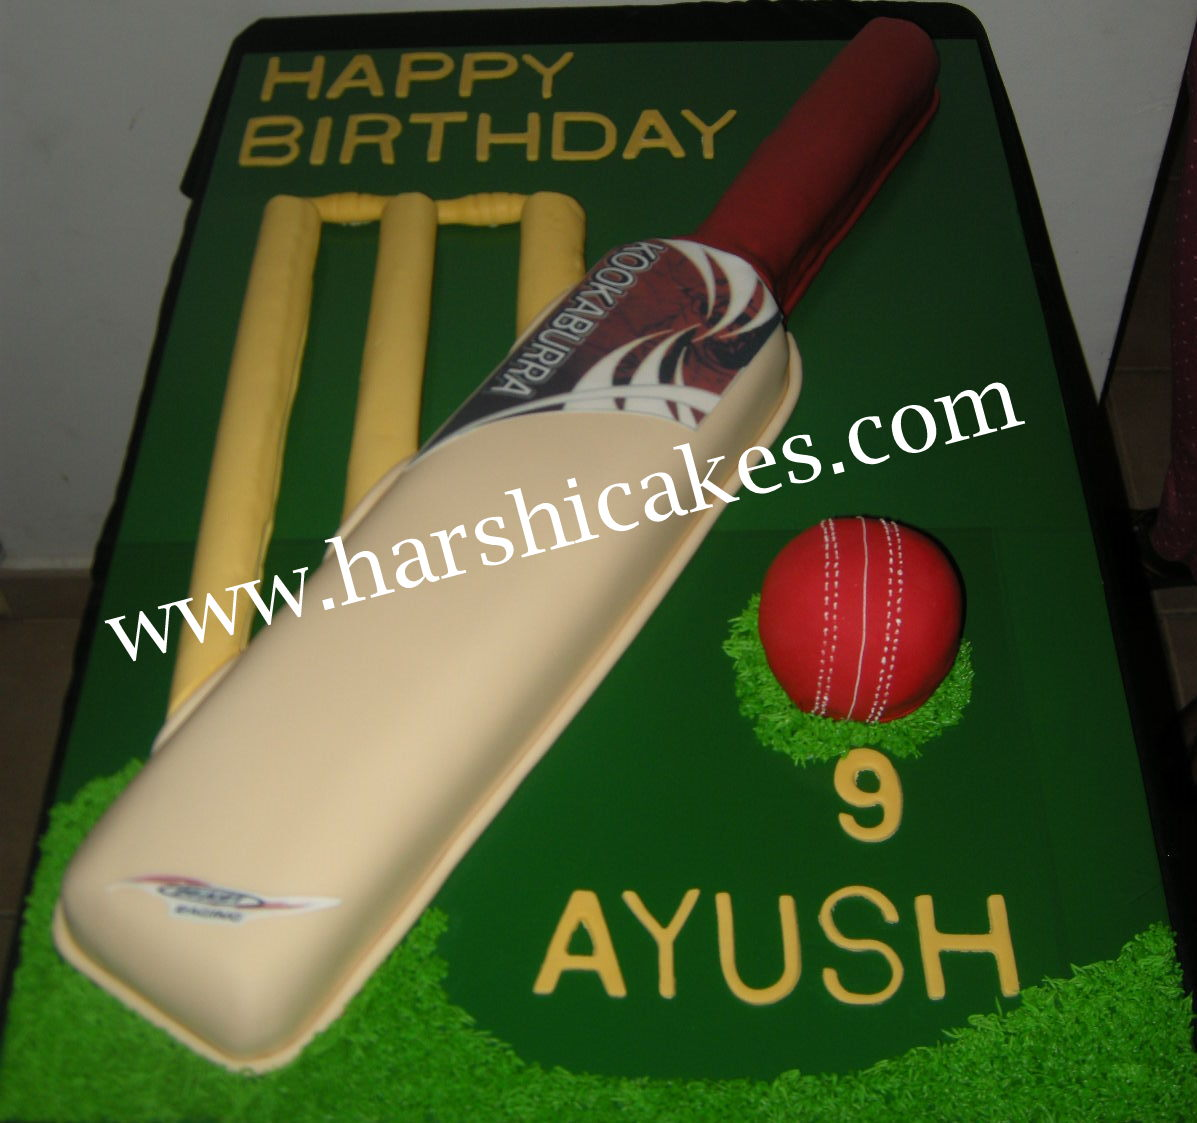 Harshi S Cakes Bakes Cricket Theme Cake For Ayush